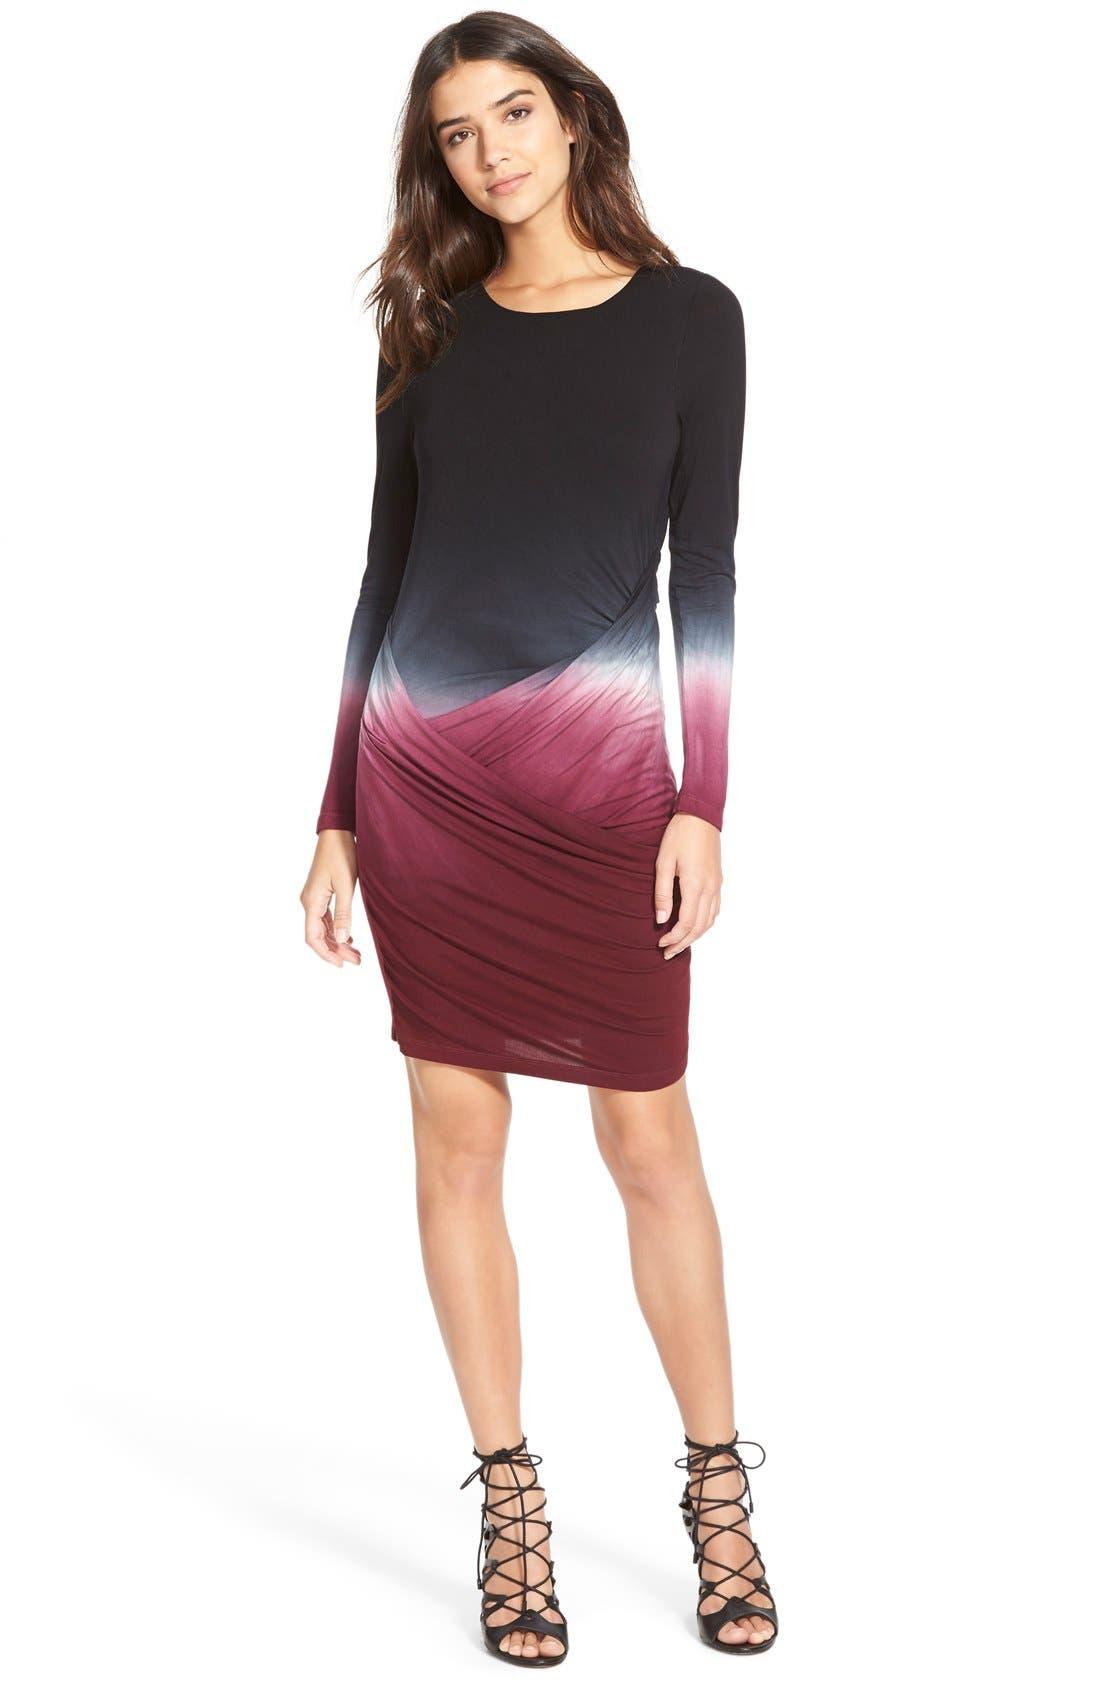 Alternate Image 1 Selected - Young,Fabulous&Broke 'Audrina' Wrap Detail Dress